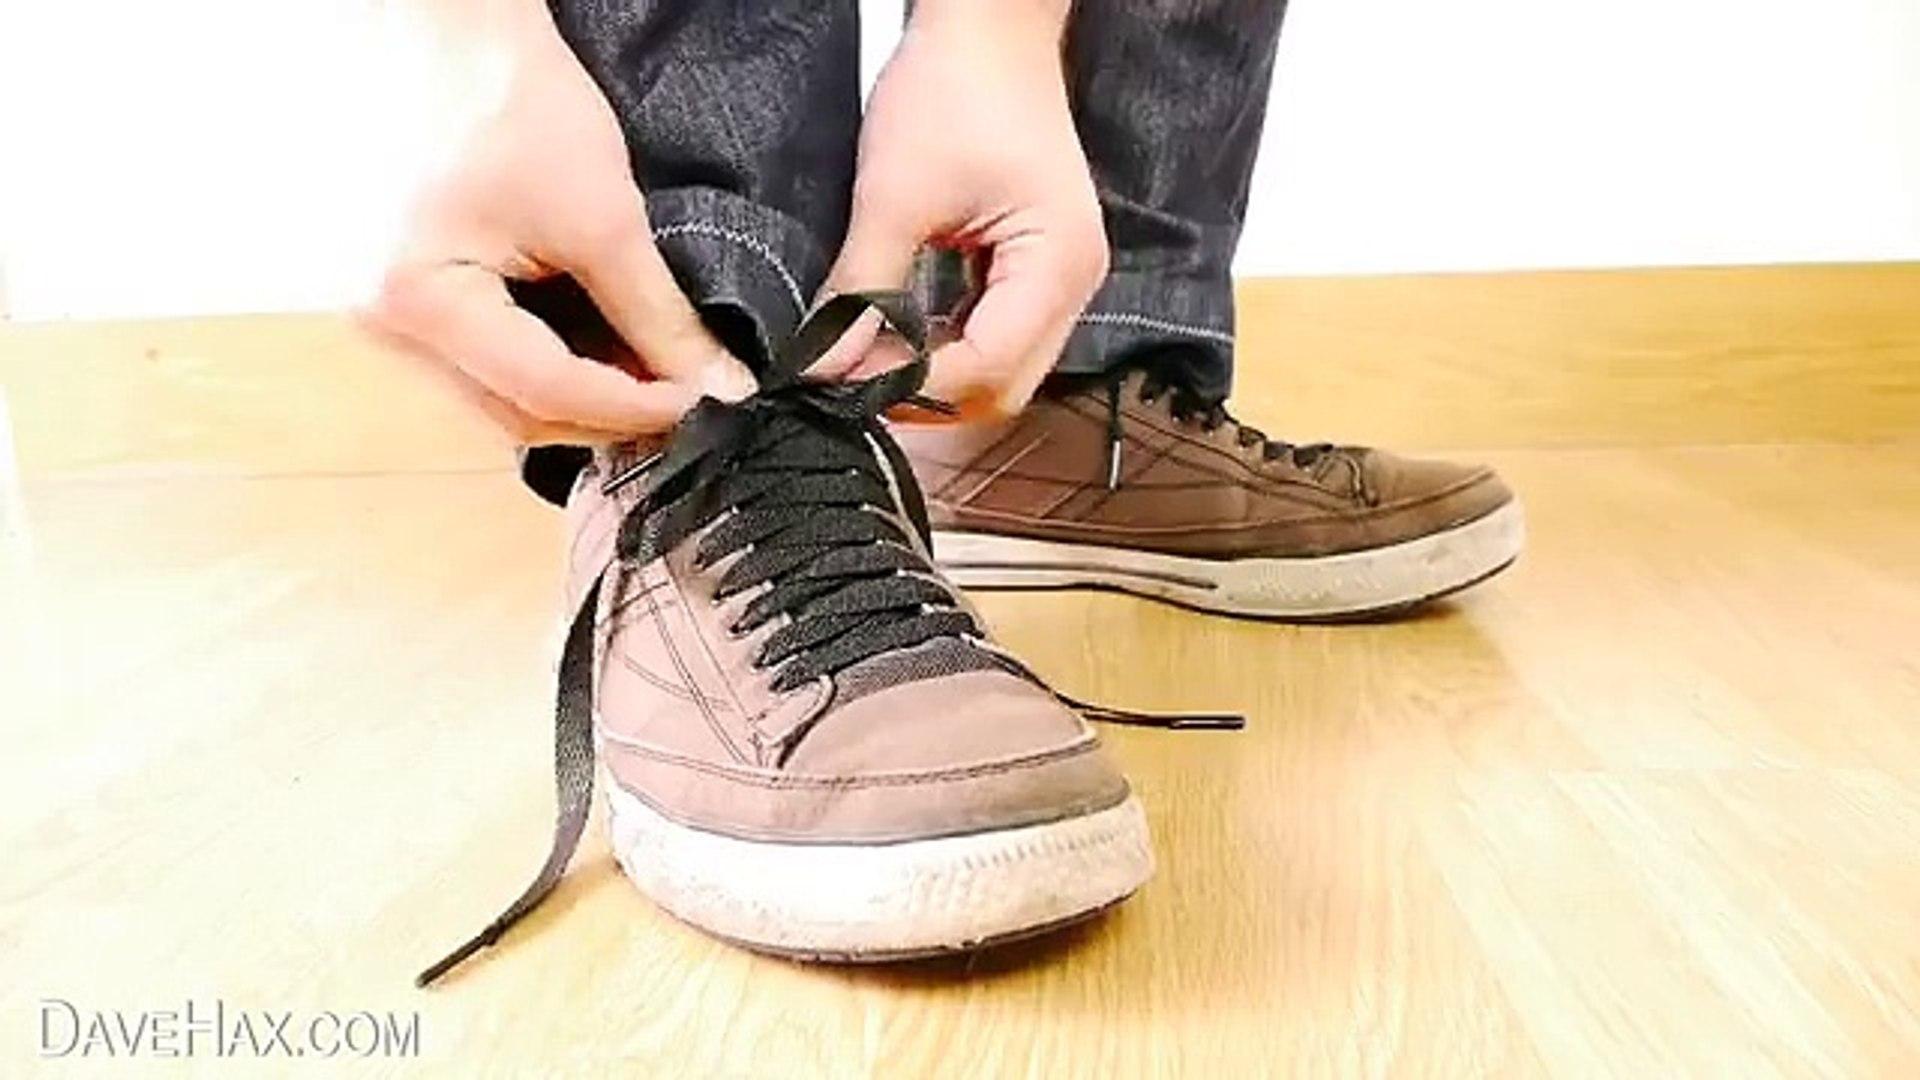 Self-Tying Shoe Lace Trick